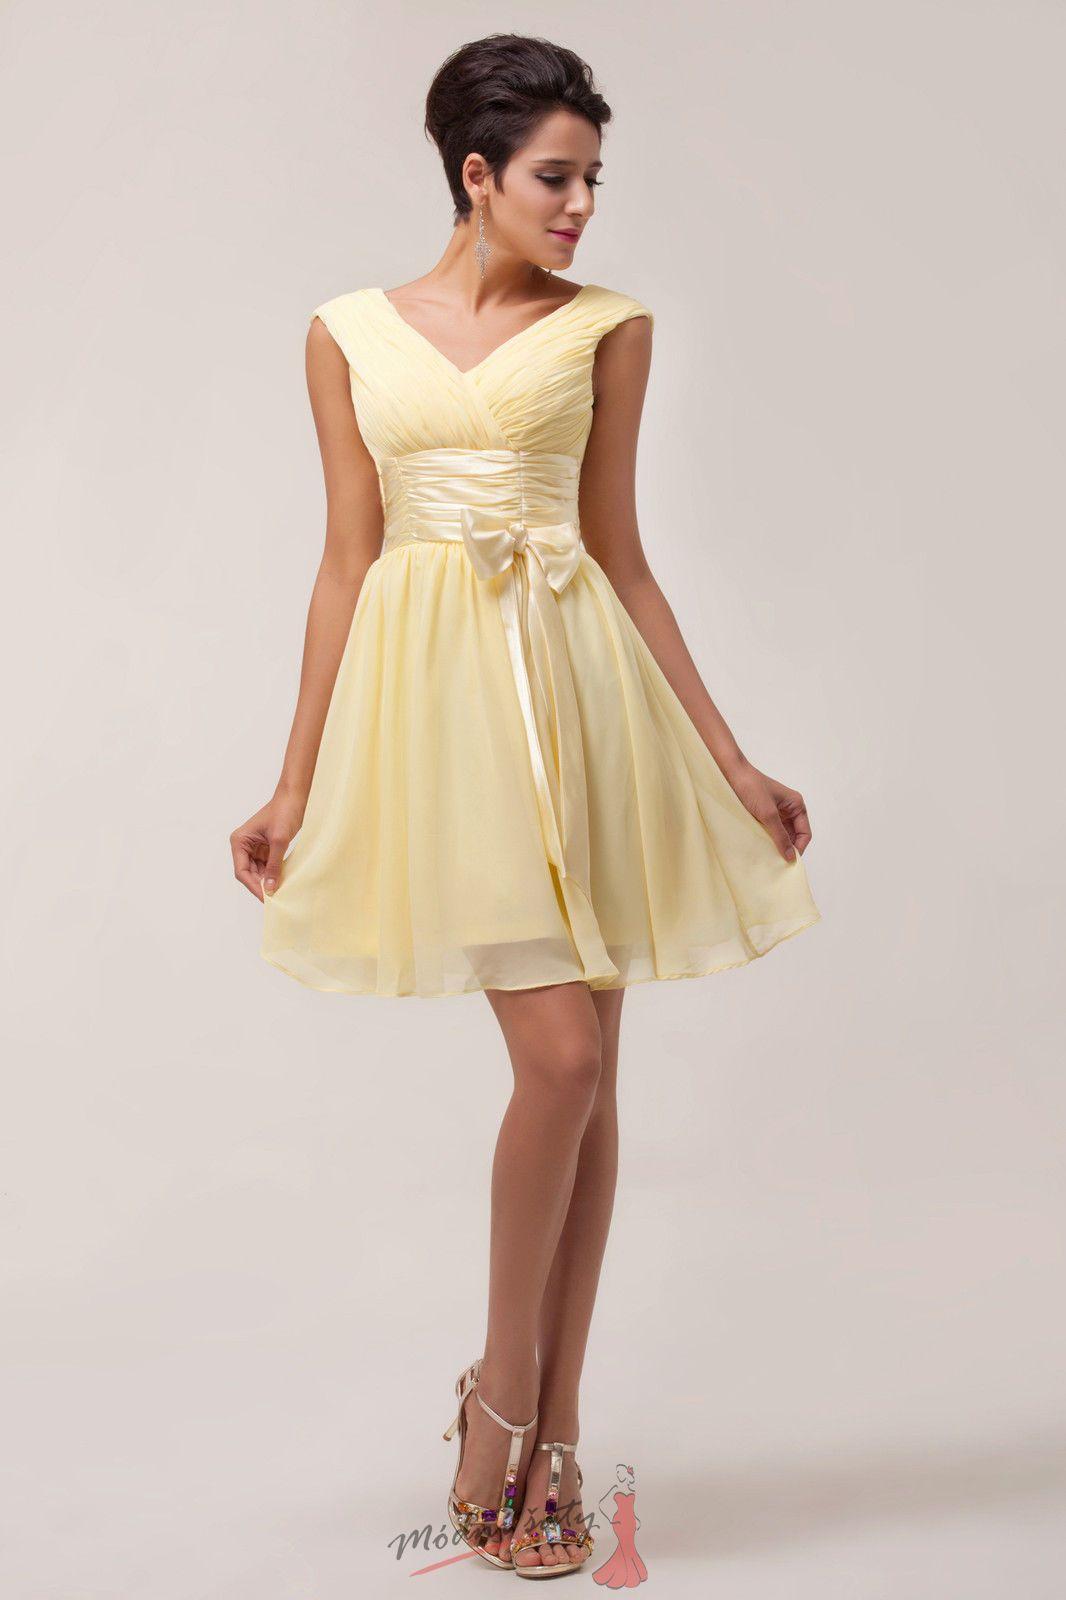 Žluté koktejlové šaty s mašlí. 2a40540aea